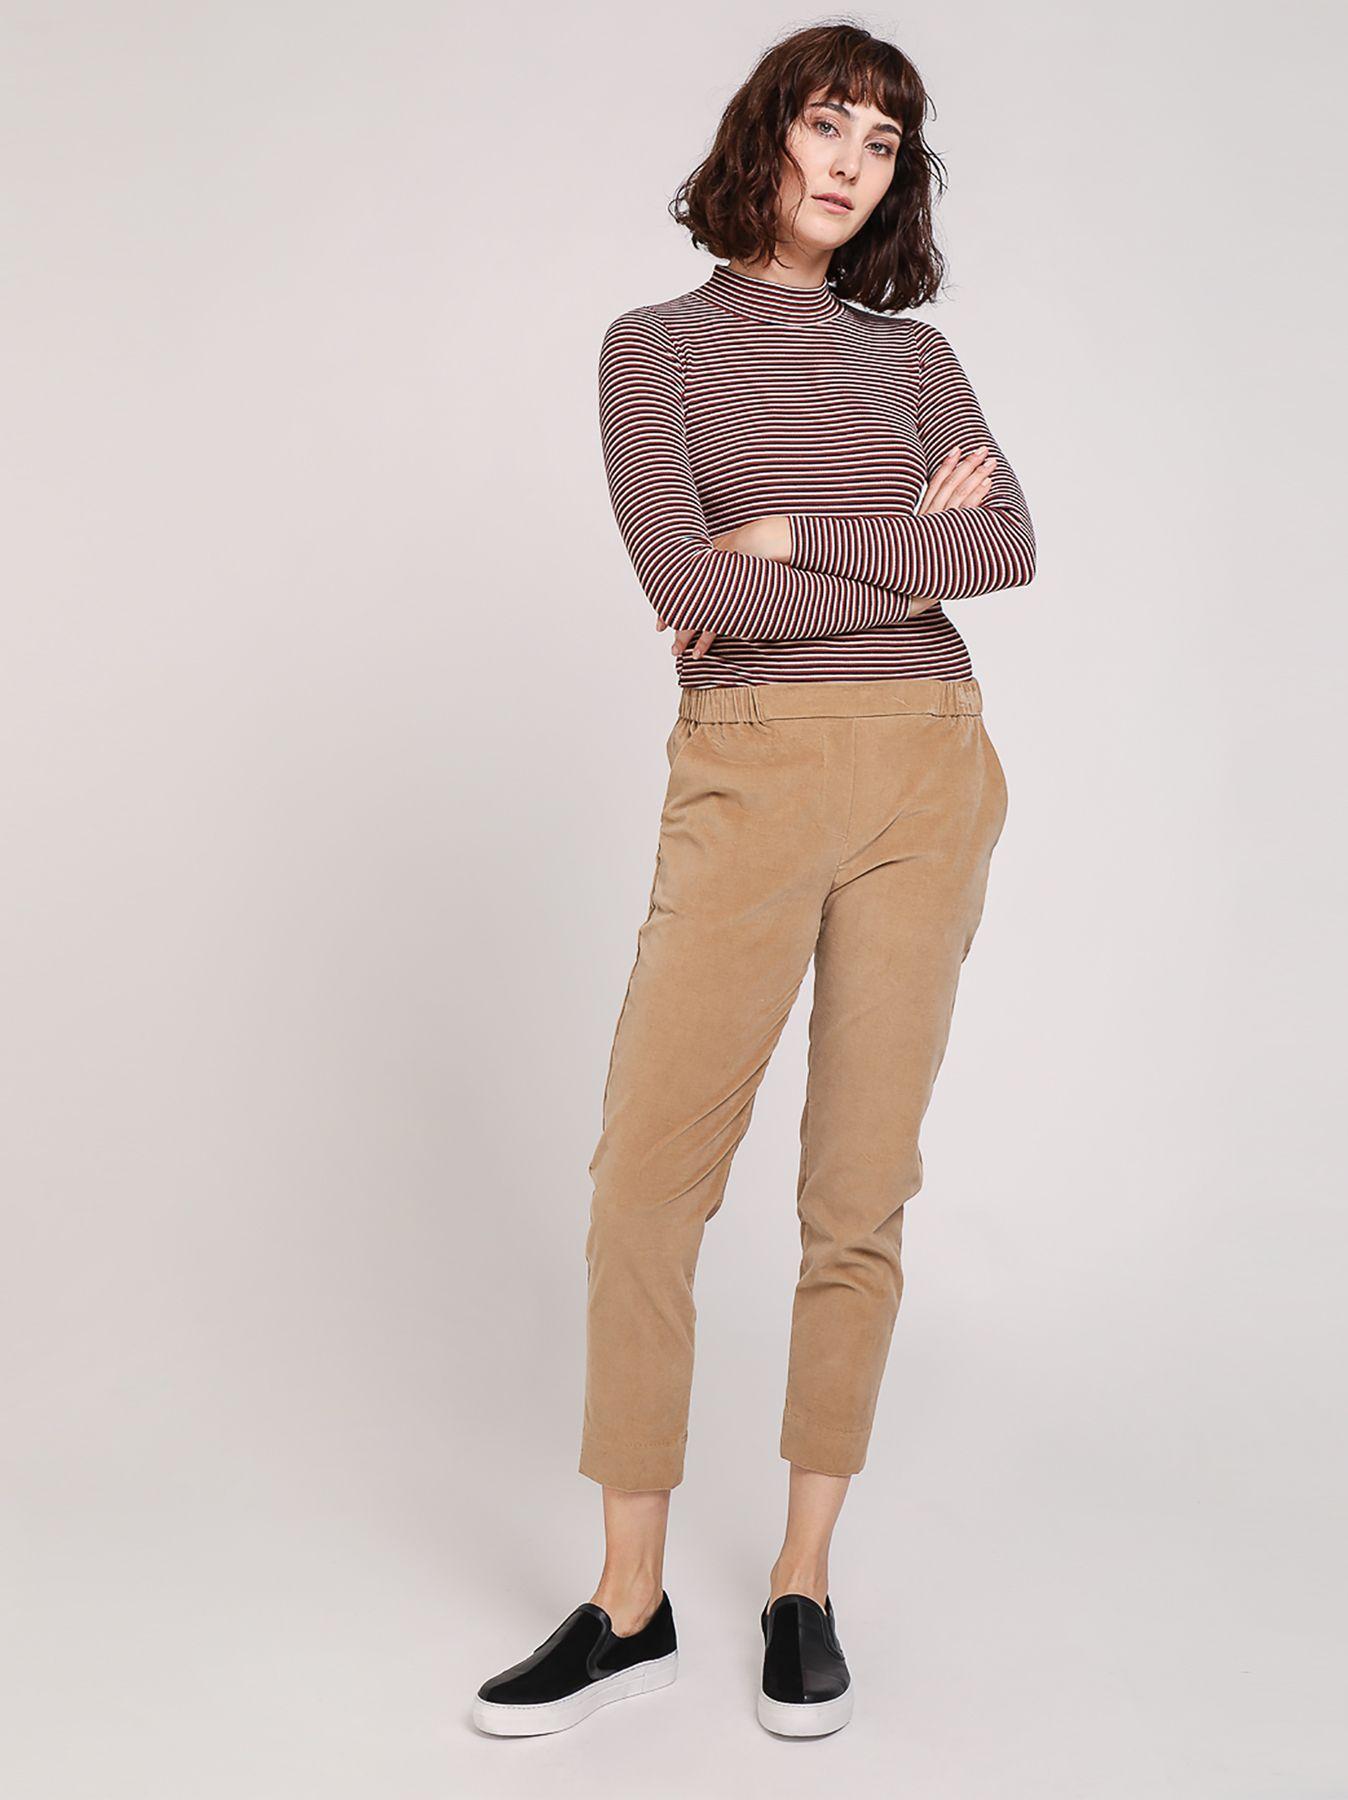 Pantalone chino effetto velluto